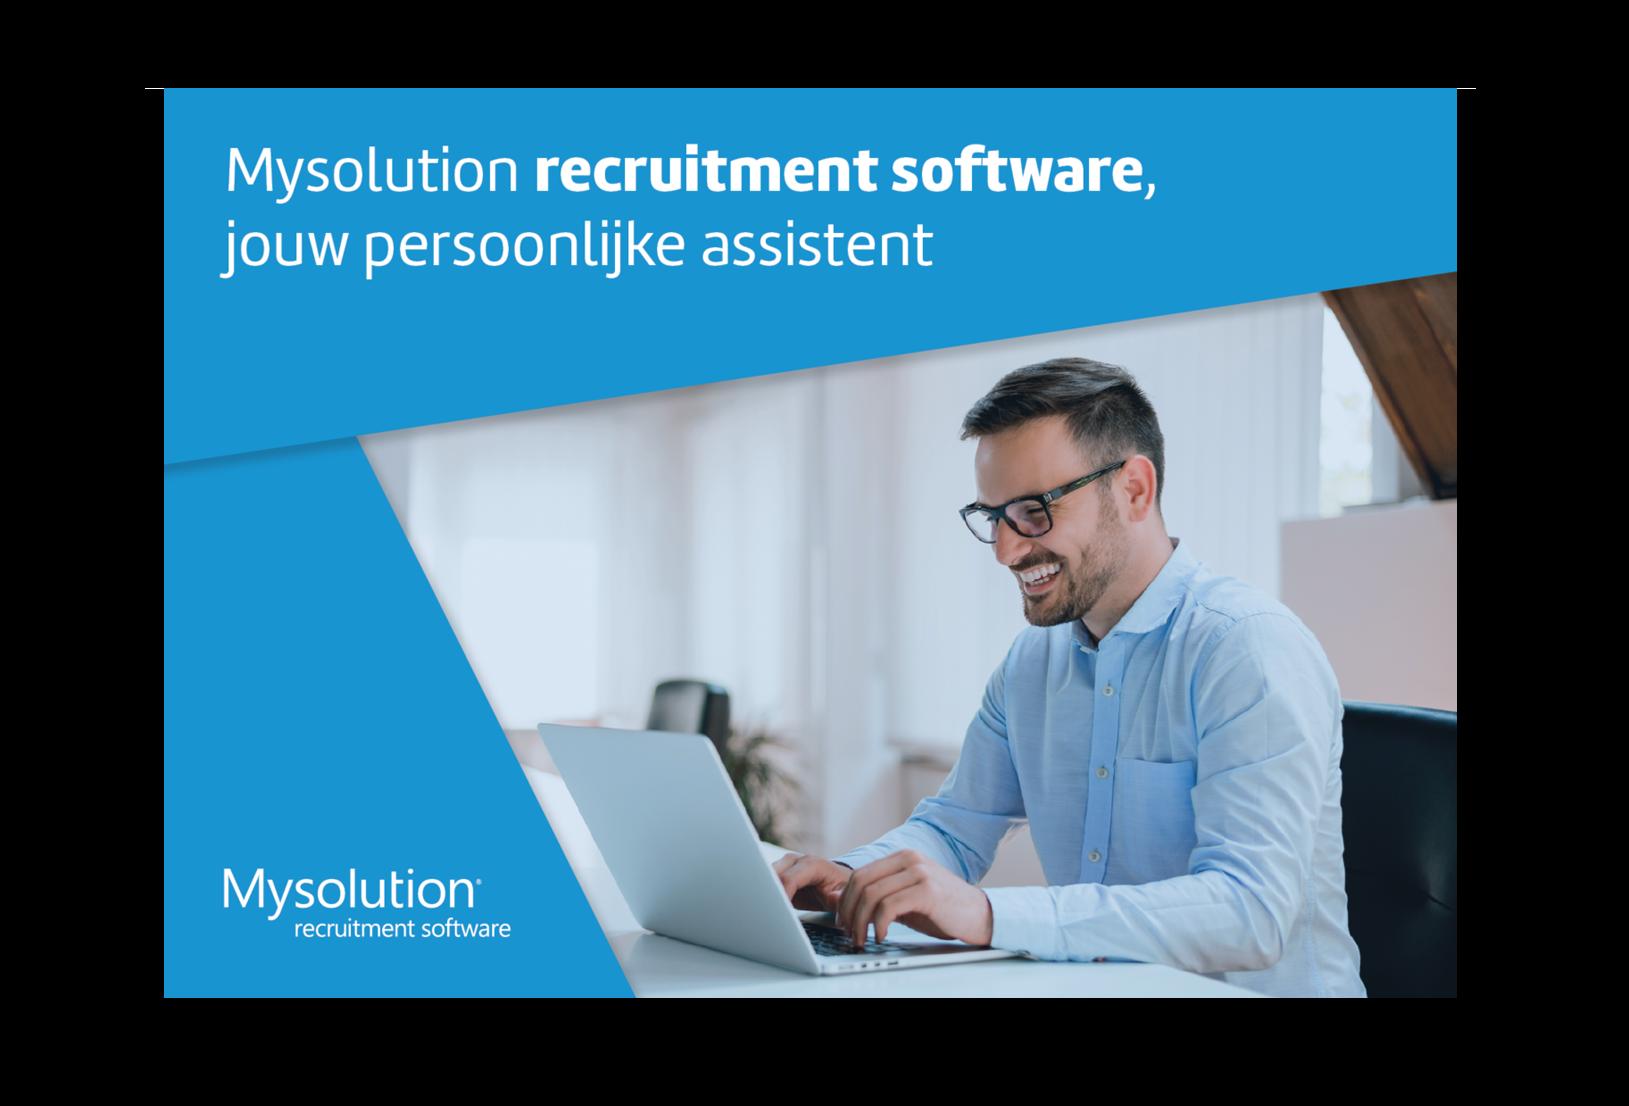 Mysolution Recruitment software